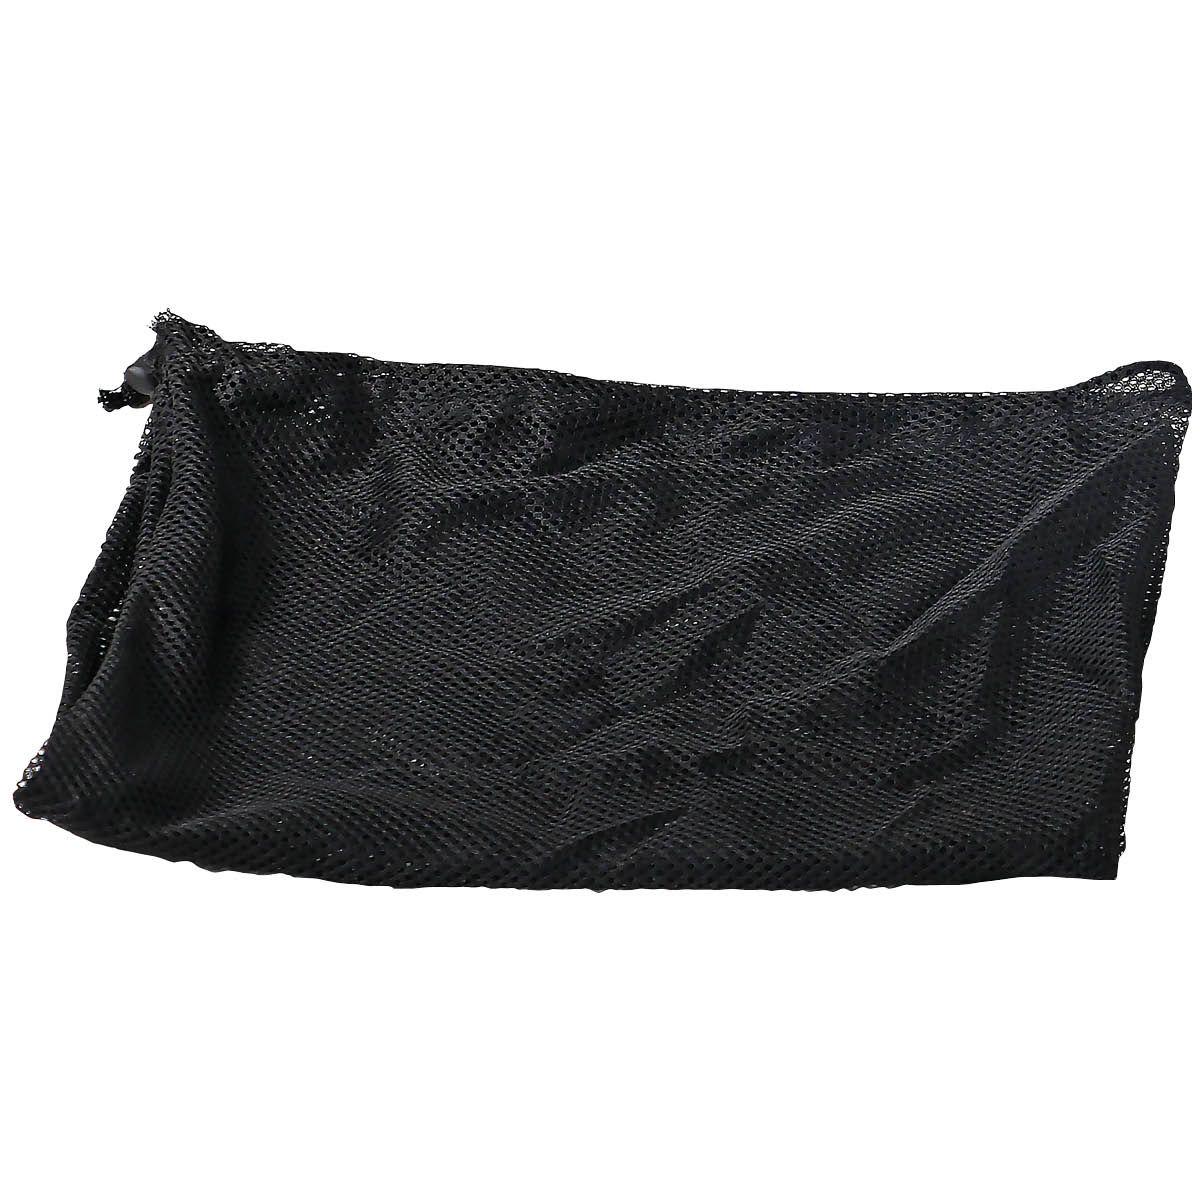 Dewalt Wet & Dry Vacuum Accessory Bag